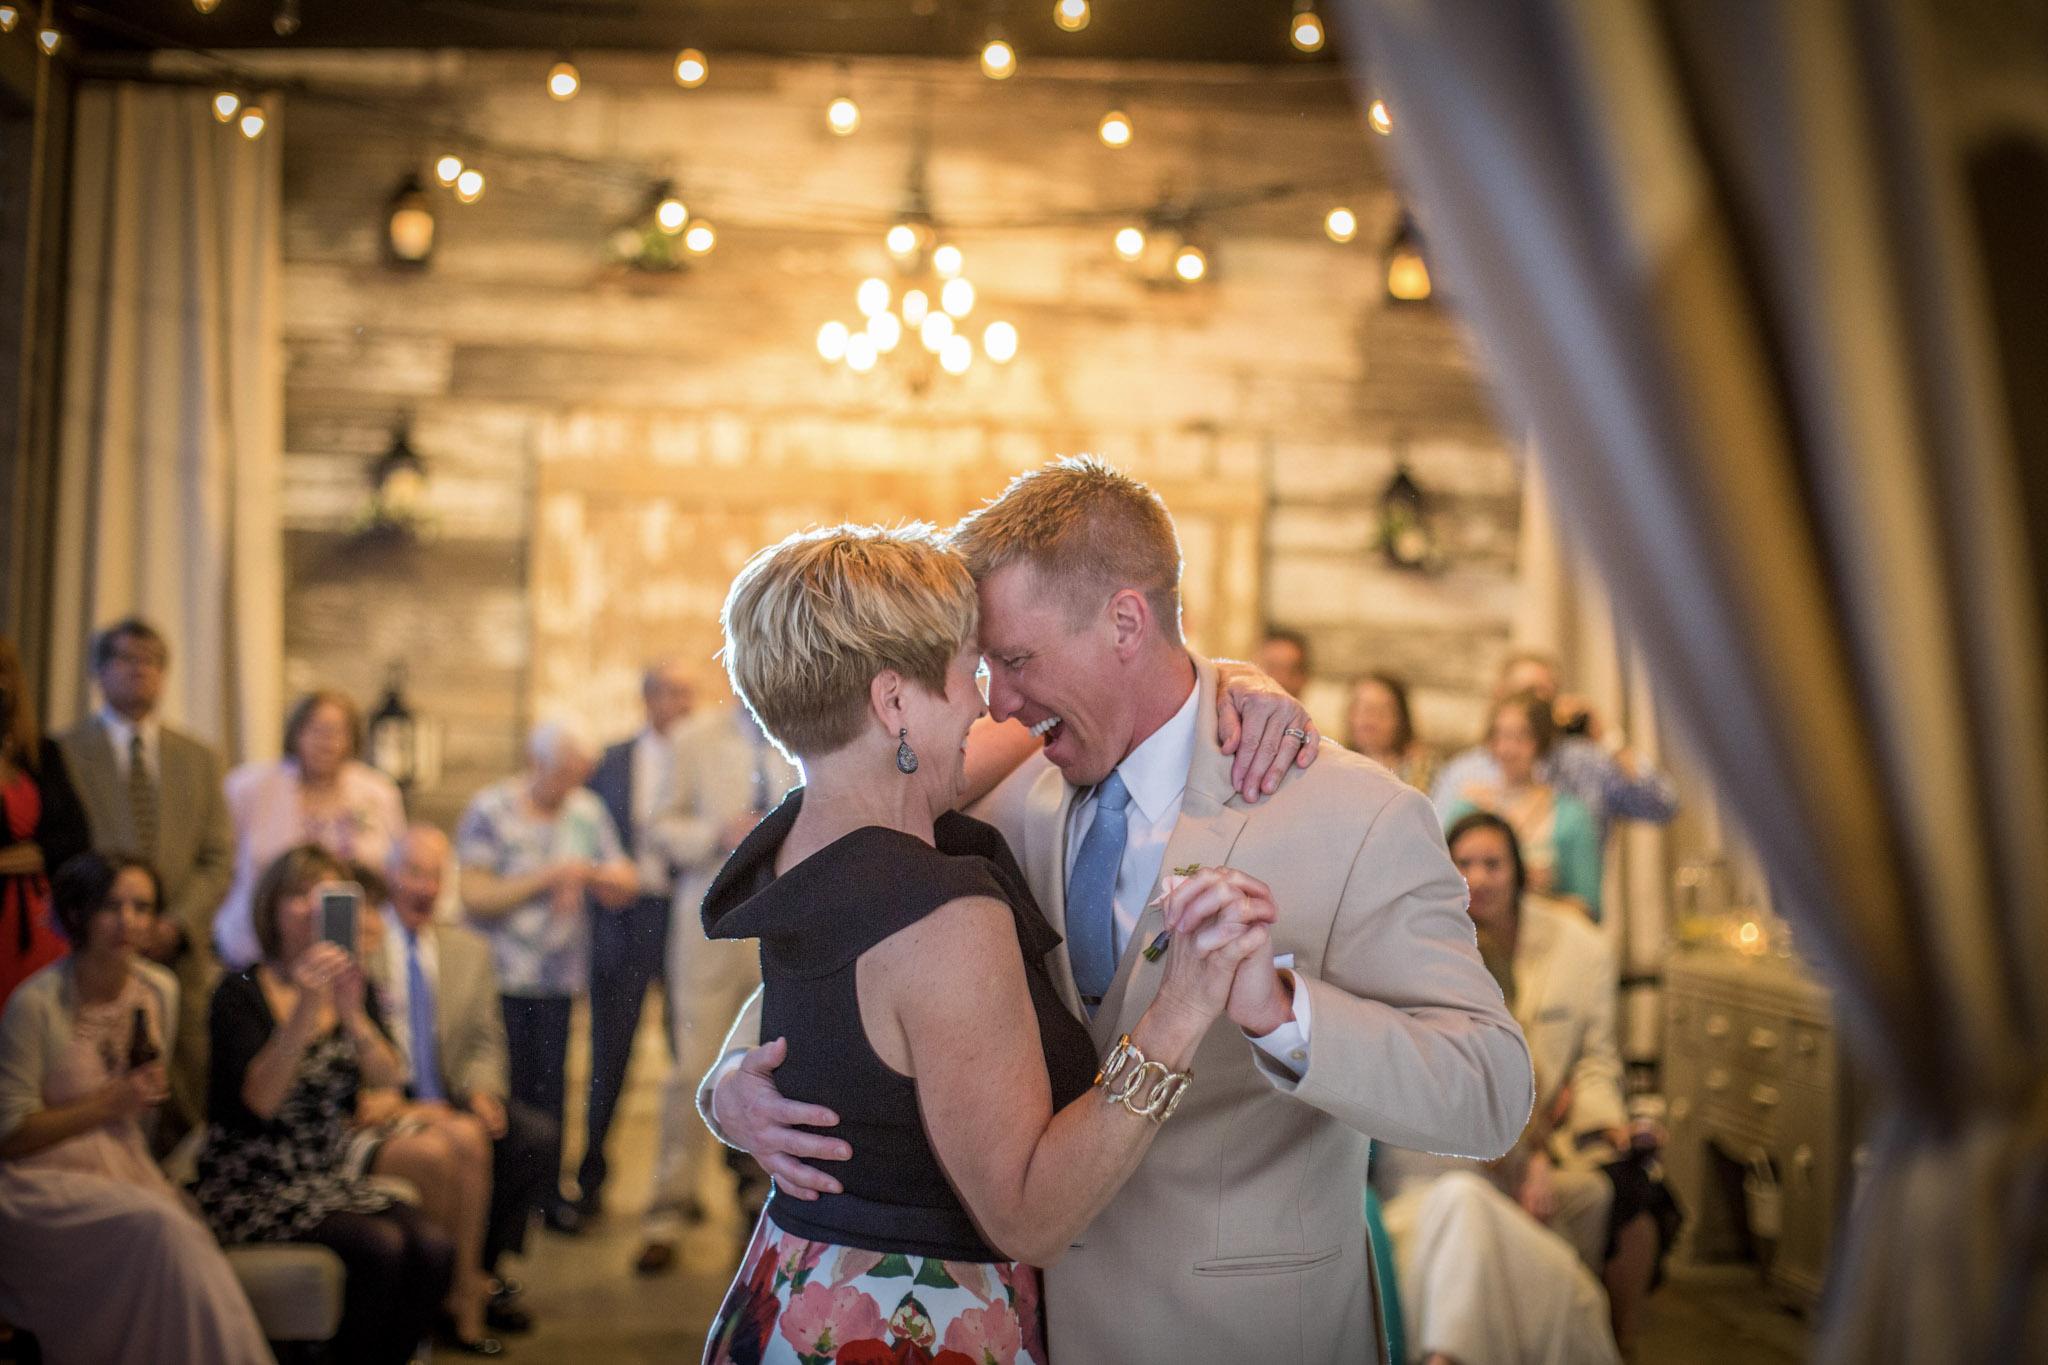 Kansas+City-Small+Wedding-Elope_Intimate_Ceremony_Mother's+Day9.jpg